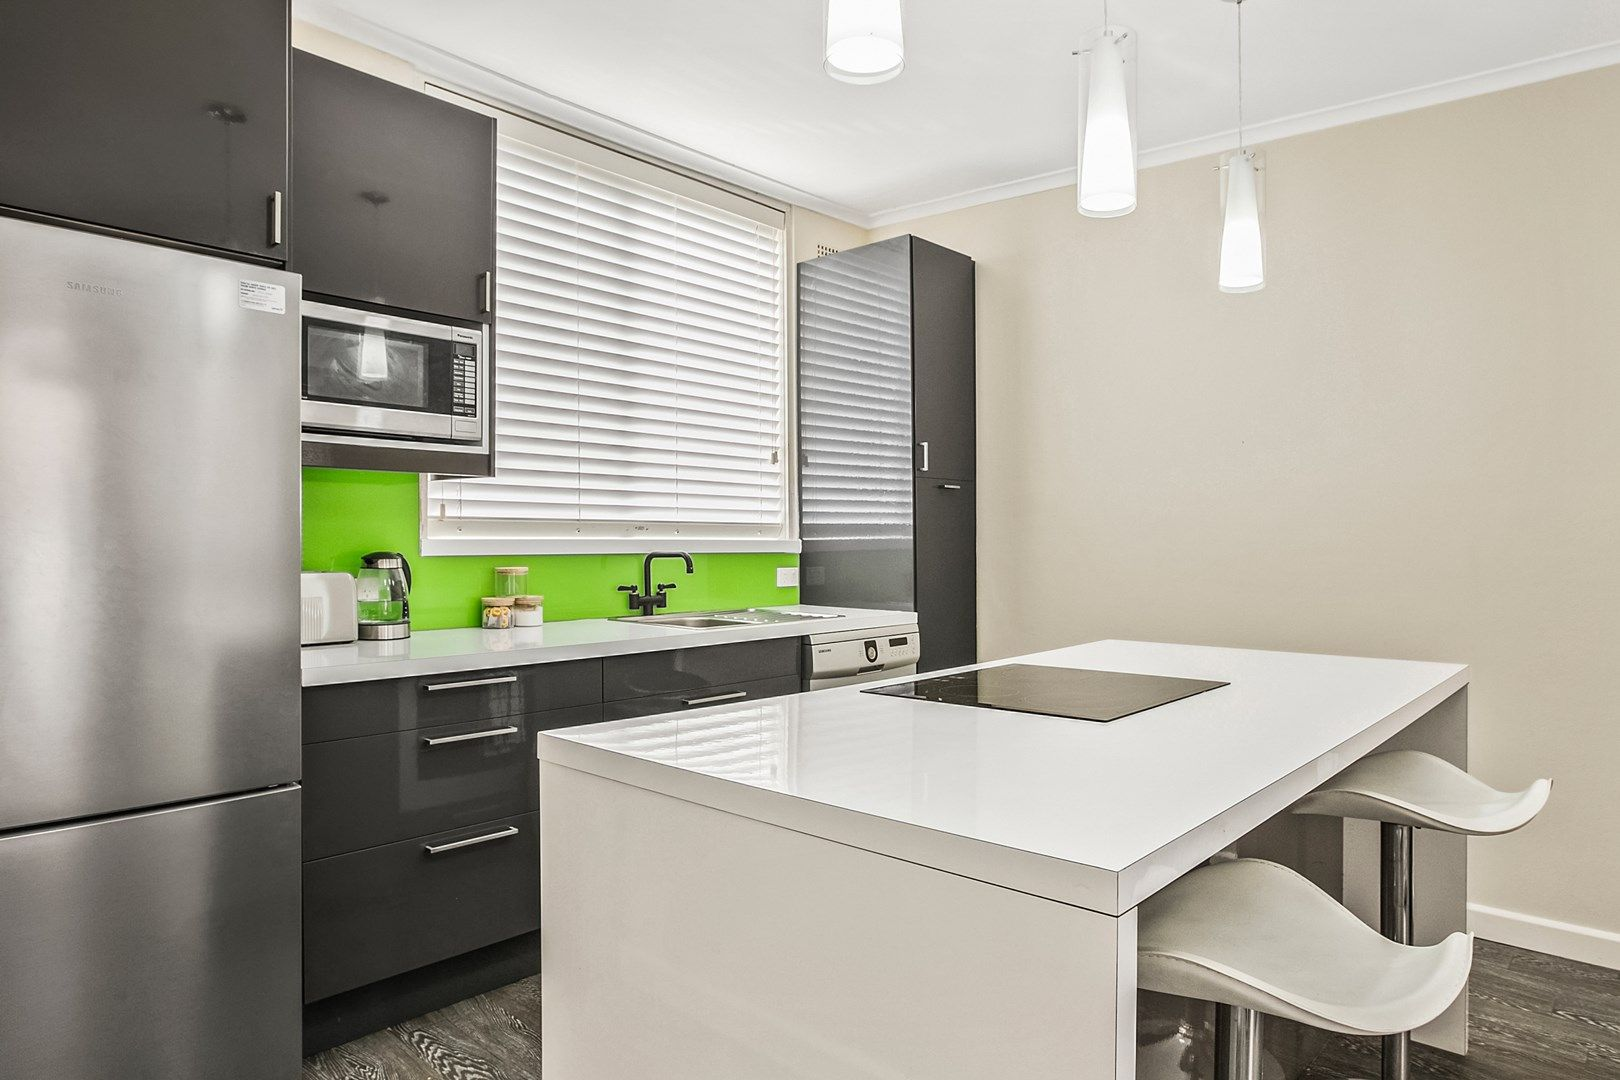 4/12 Caronia Avenue, Cronulla NSW 2230, Image 0